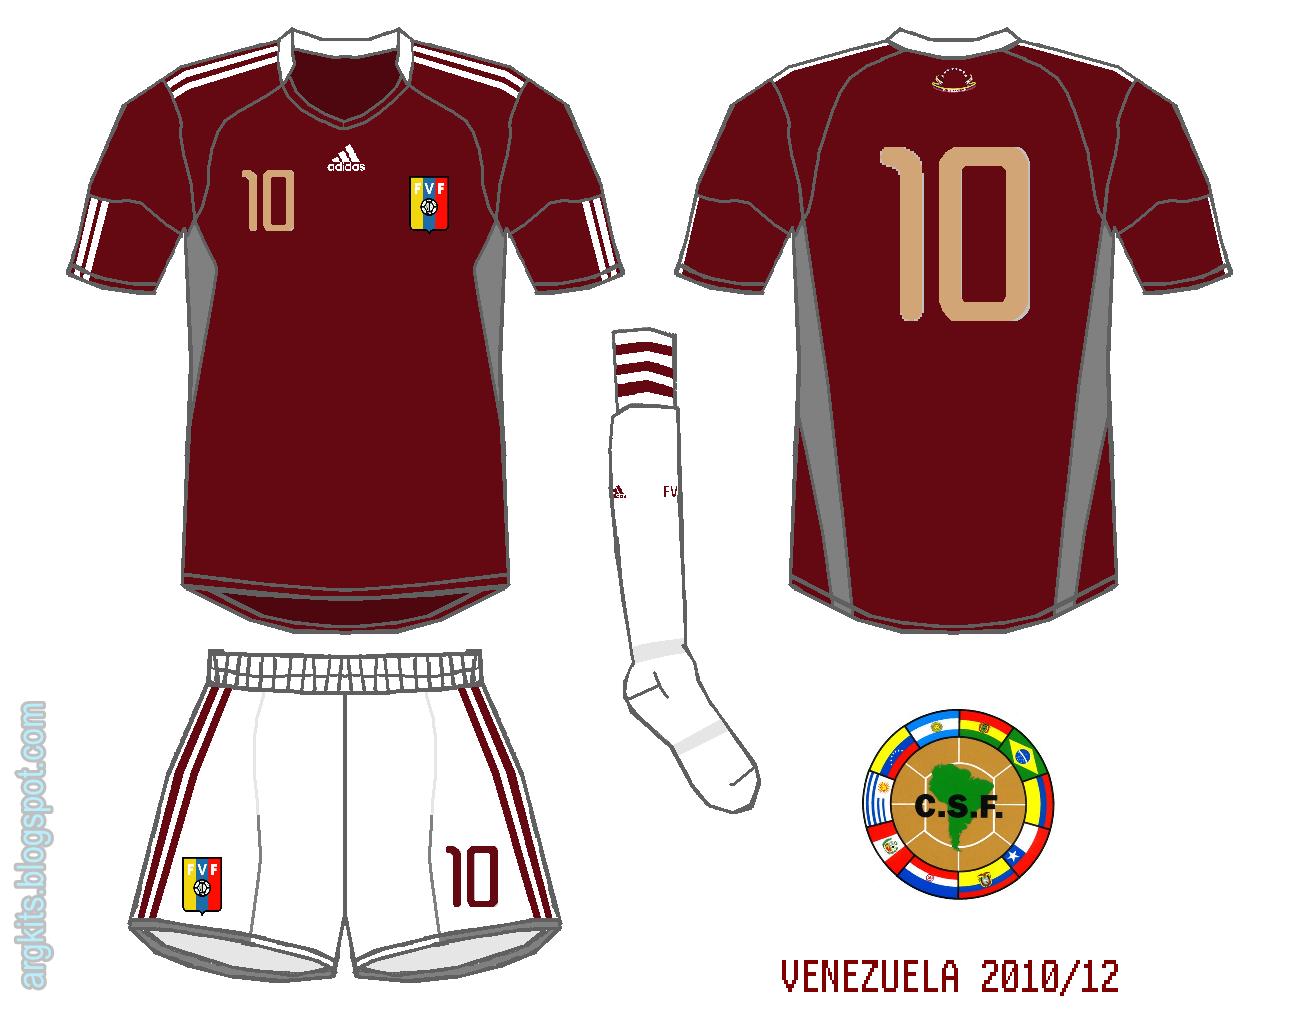 Venezuela 2010/12 (home)